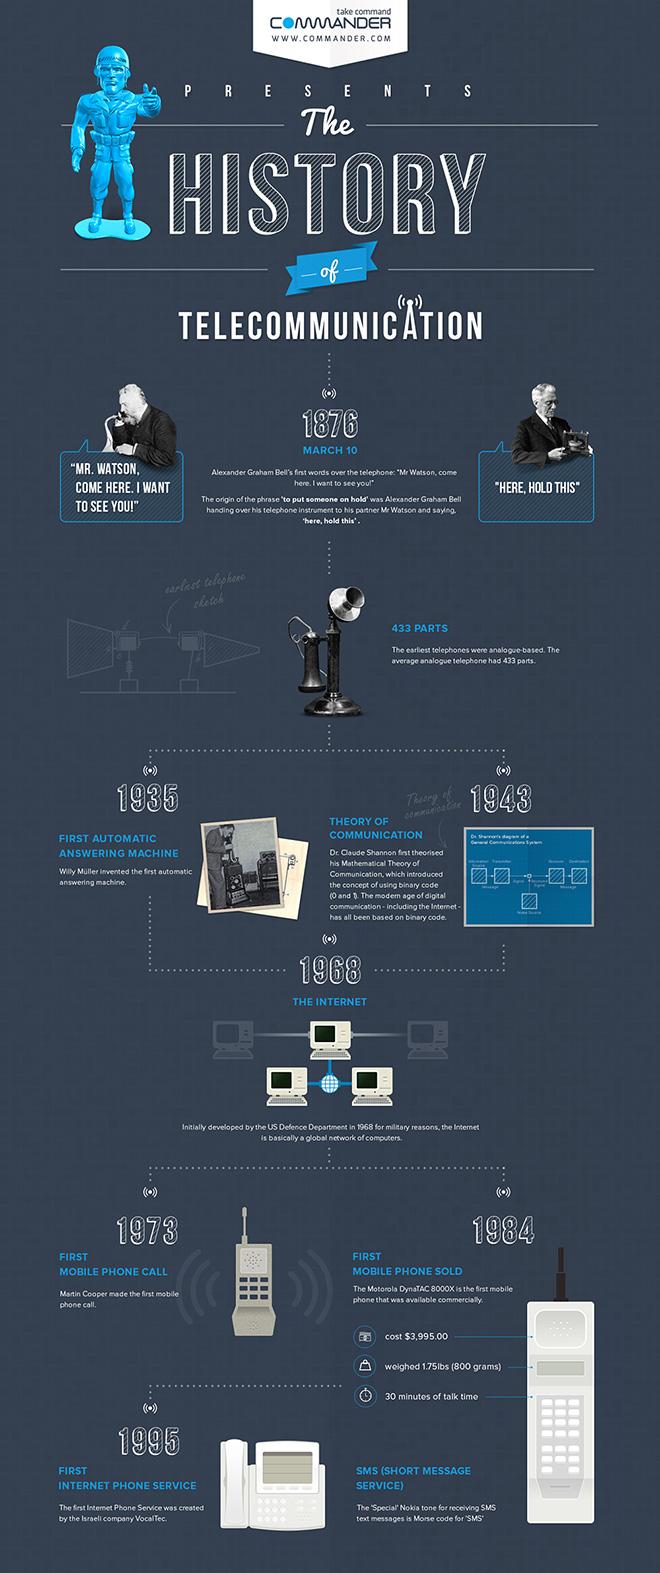 Commander Infographic